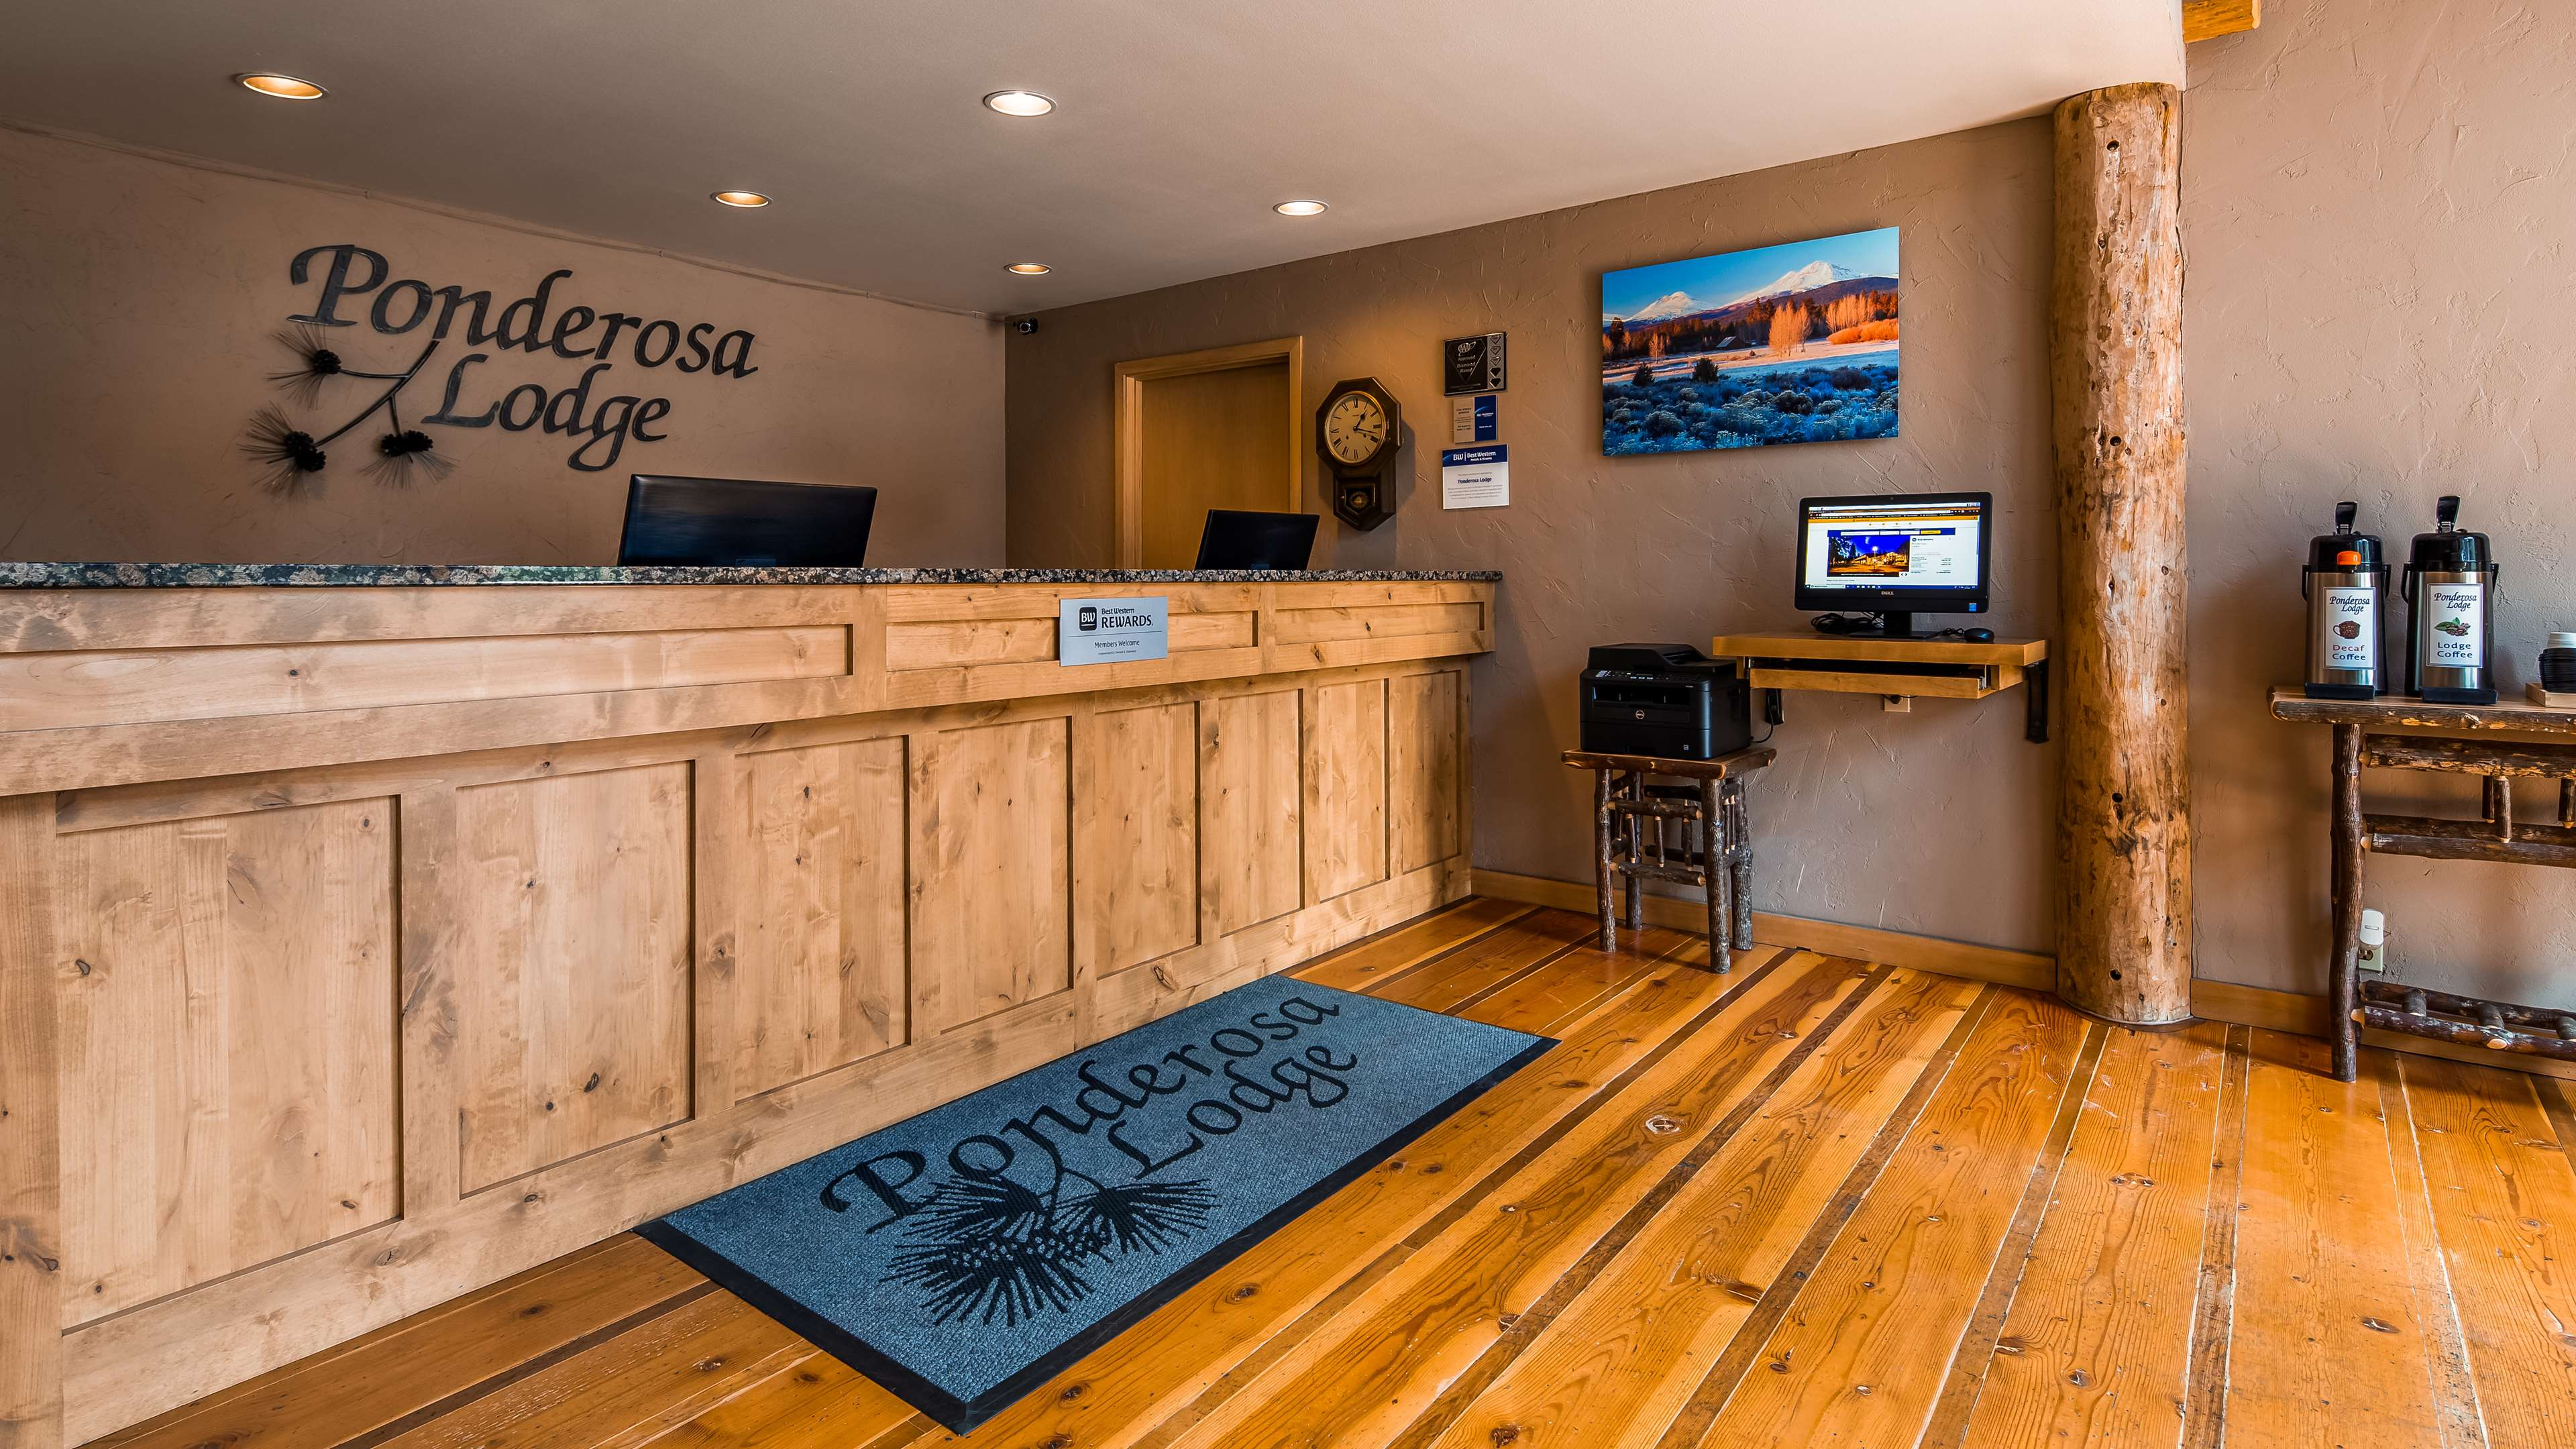 Best Western Ponderosa Lodge image 2